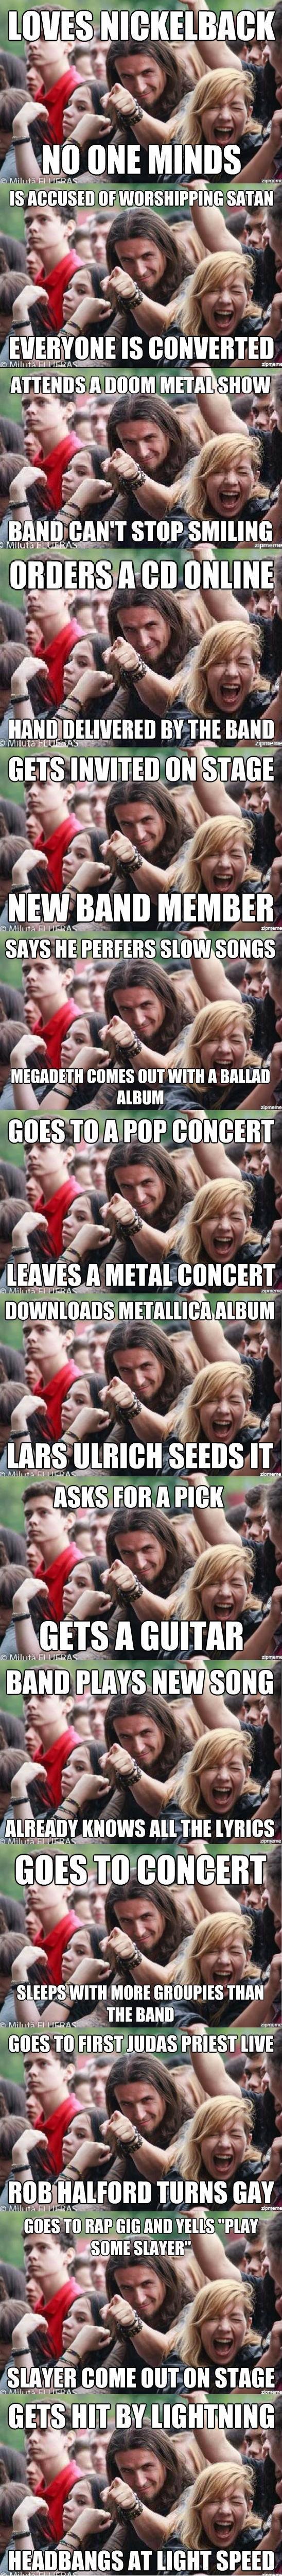 "Rediculously Photogenic Metalhead. I love metal guys.. HINT STOP, , wll, Alli, gals, ilma NIH! Big"" GUM'S III"" WITH ll PM county] Ifly, manna akuma I: v Taser A"